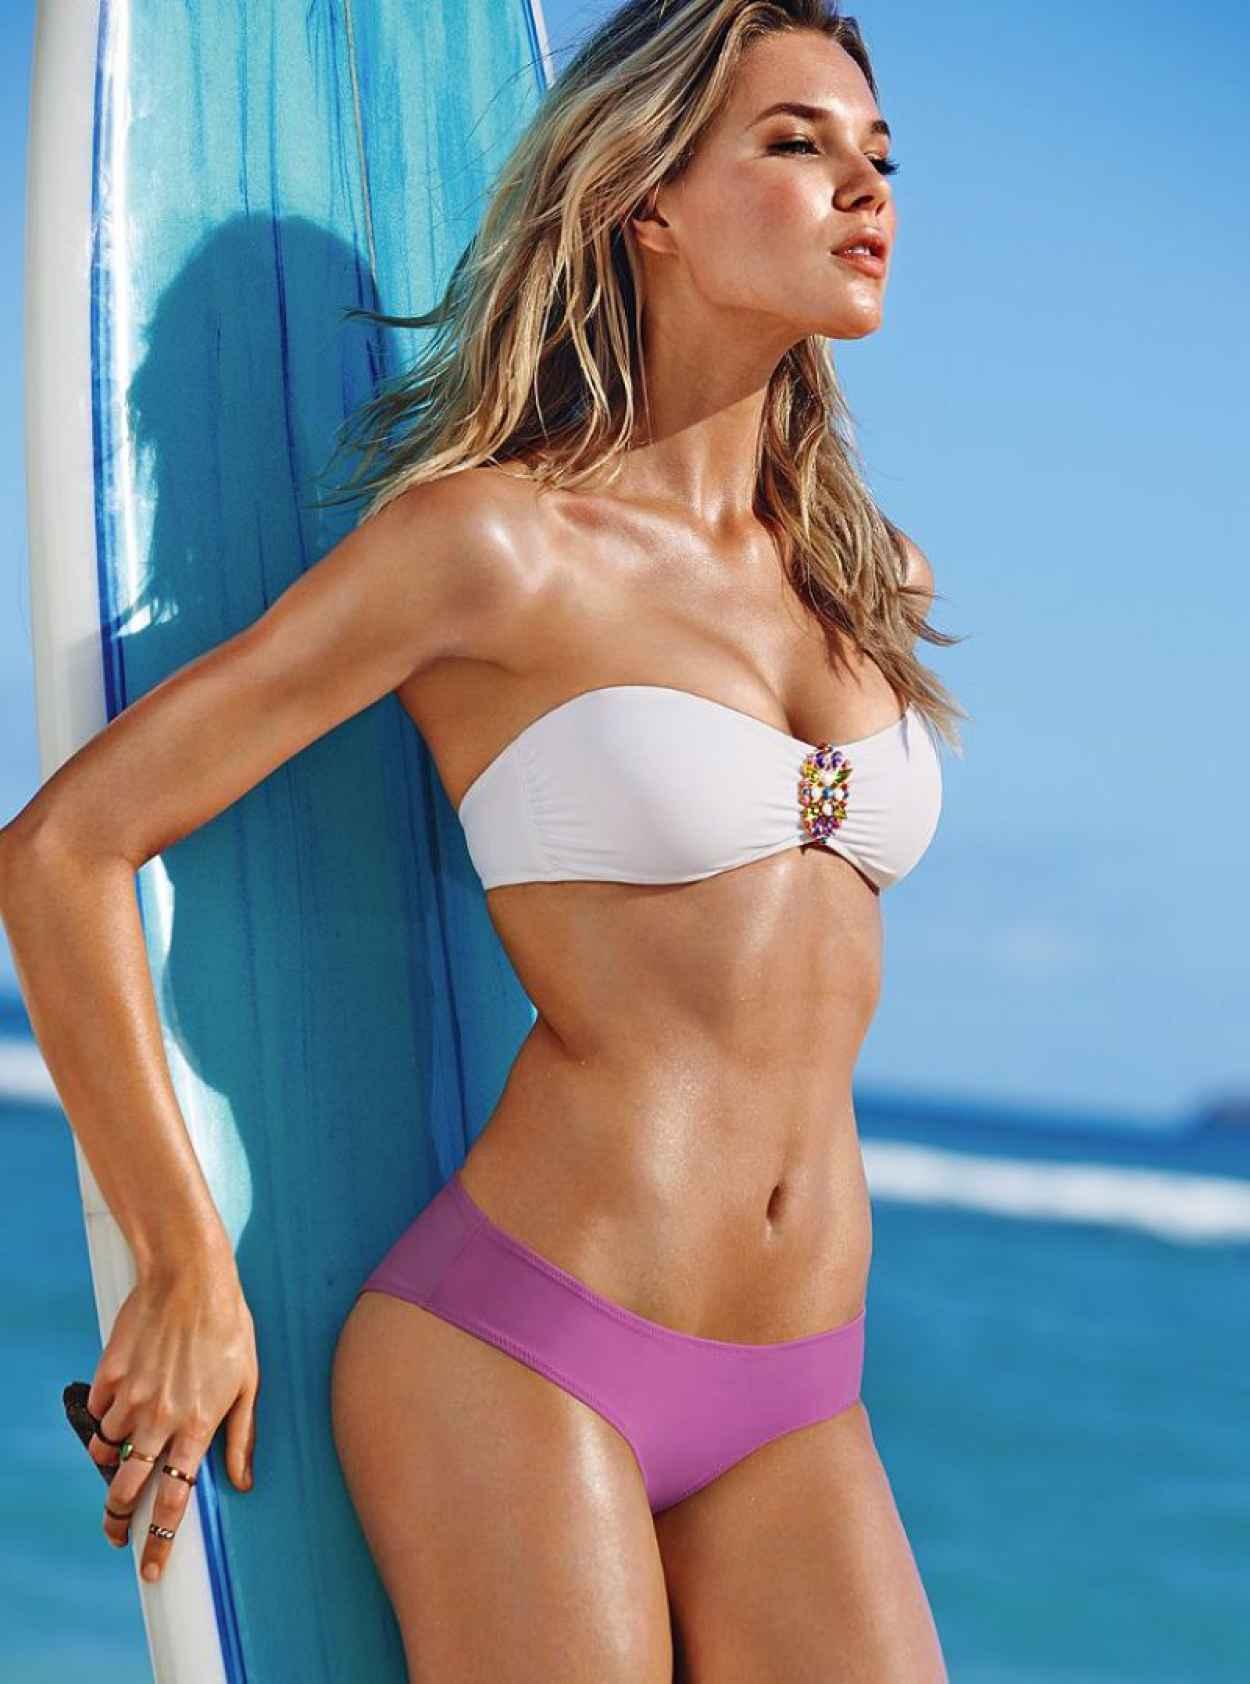 Britt Maren - Photoshoot for Victorias Secret - January 2015-1